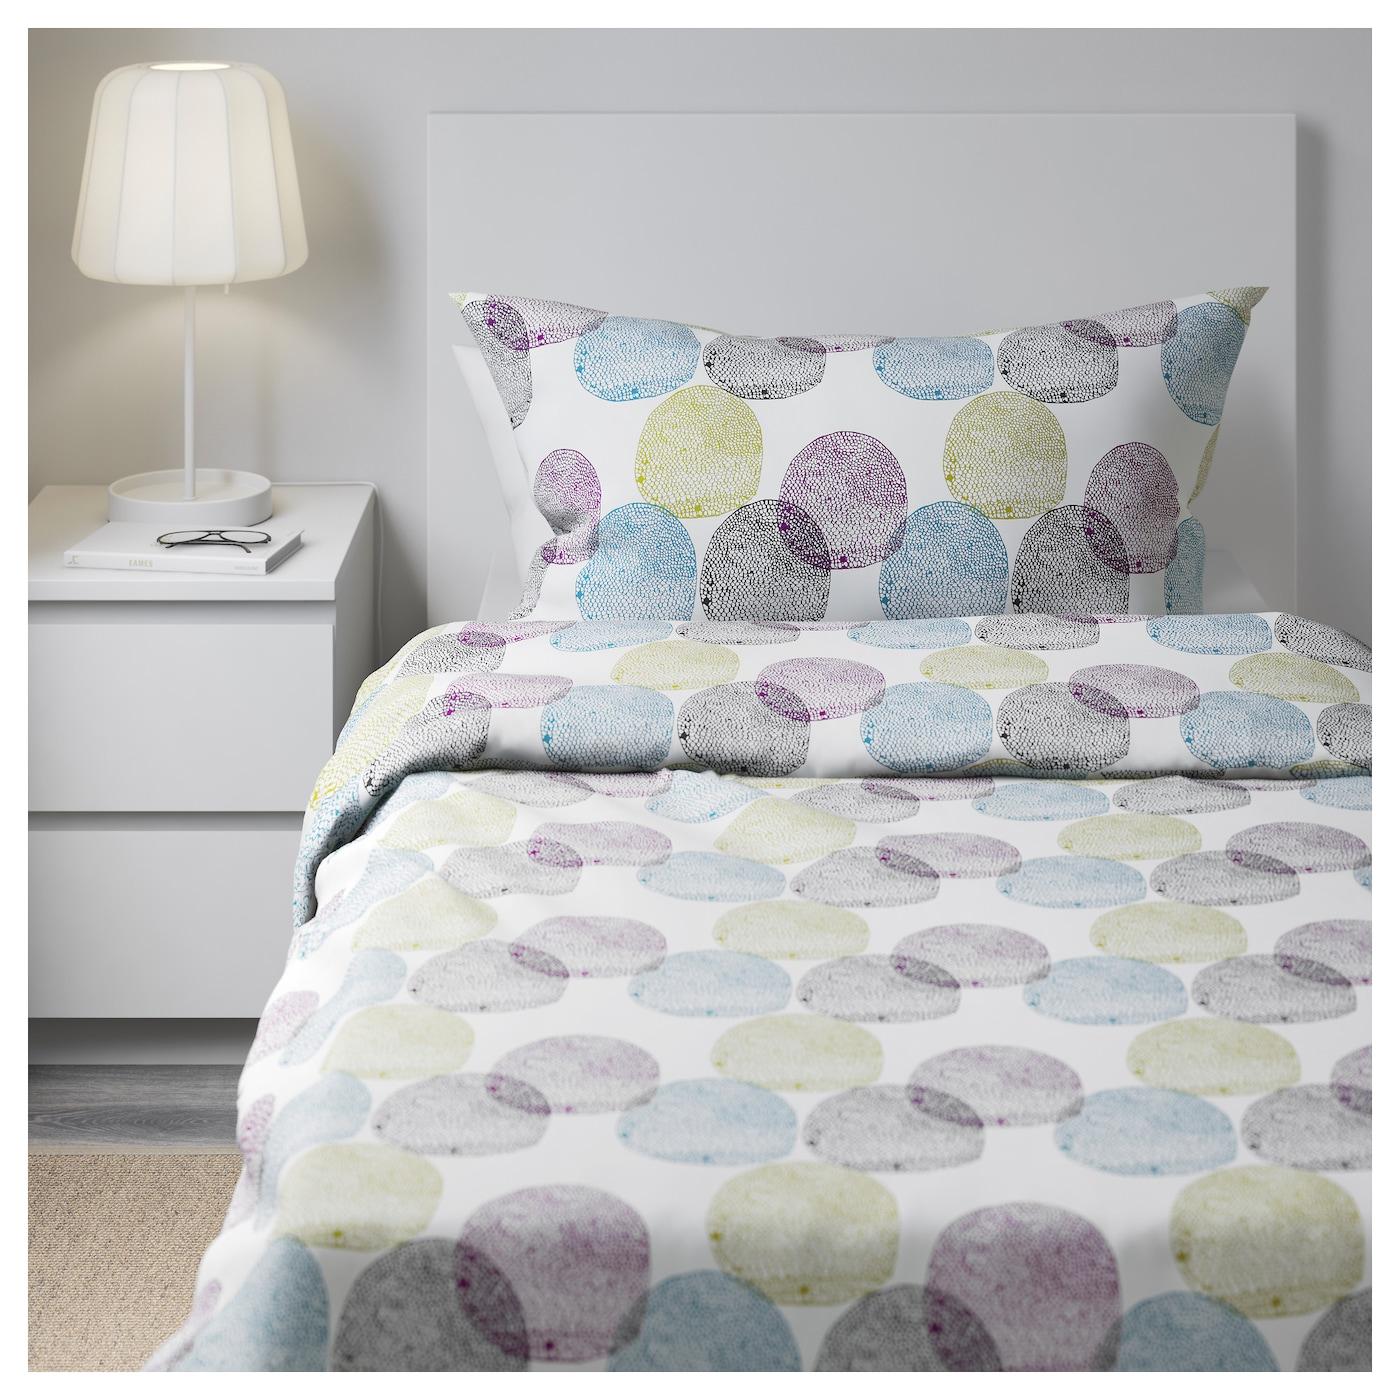 malin rund housse de couette et taie multicolore 150x200 50x60 cm ikea. Black Bedroom Furniture Sets. Home Design Ideas